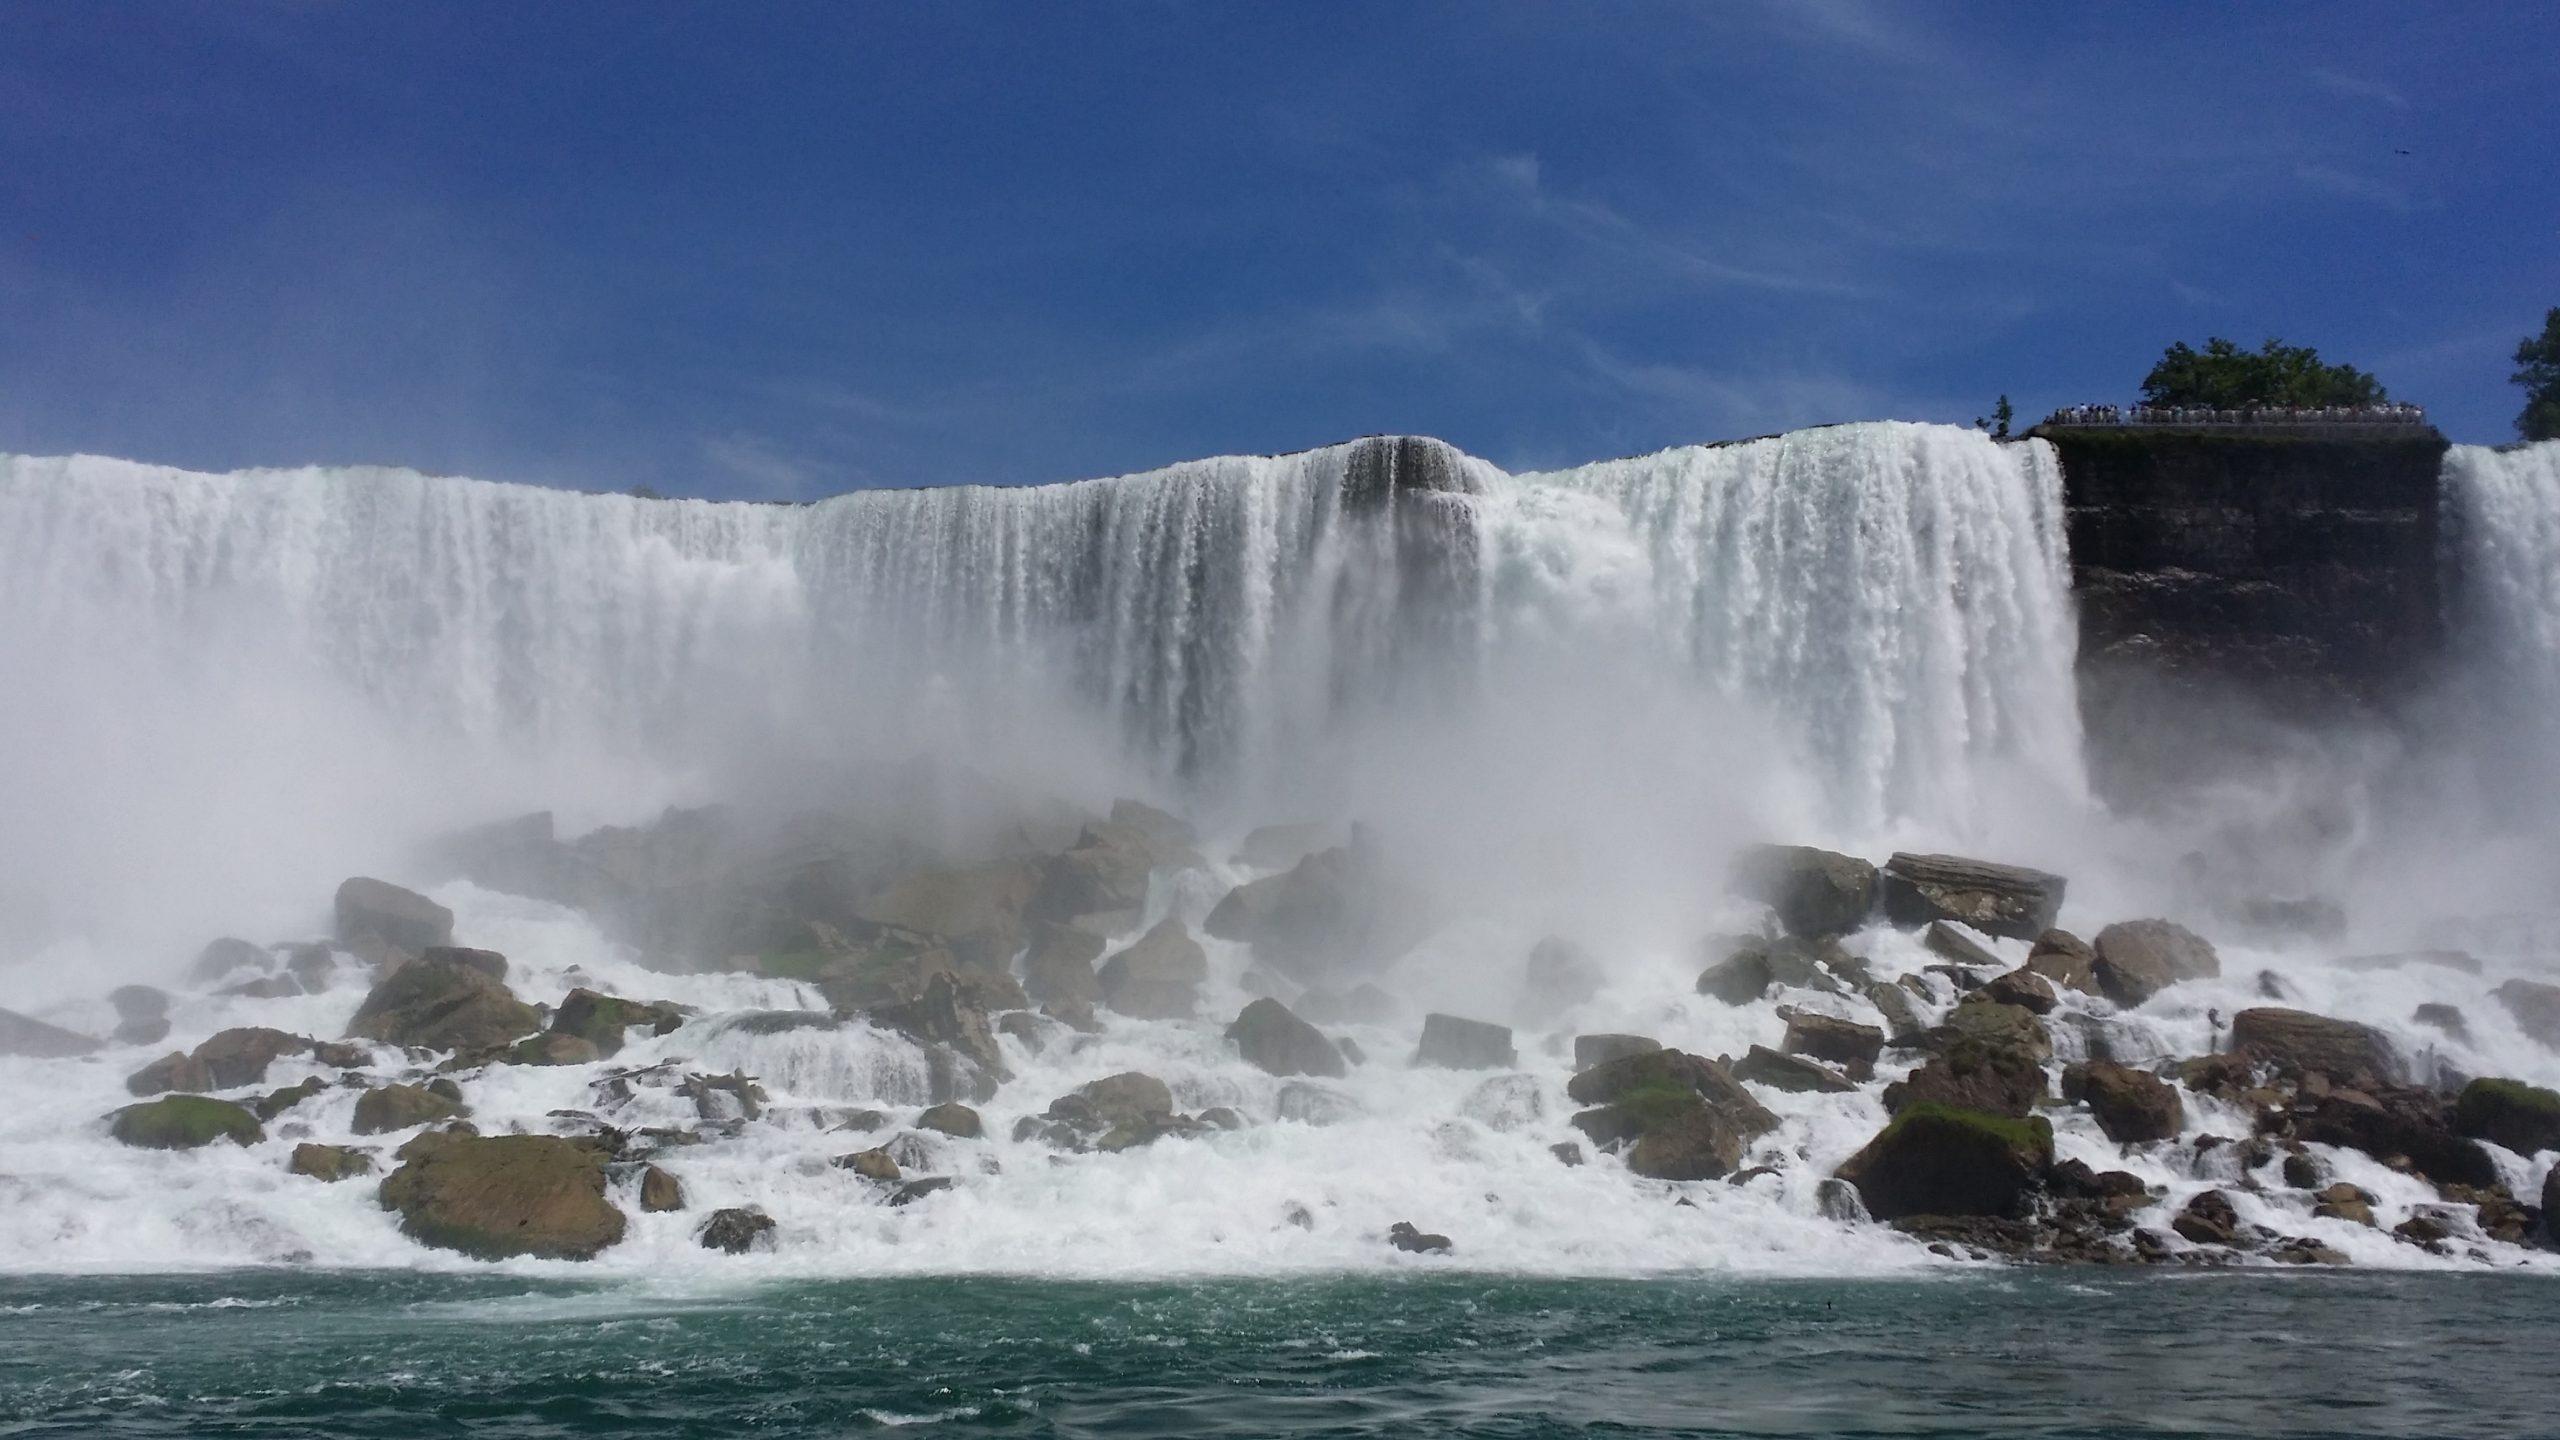 Niagara Falls during the day